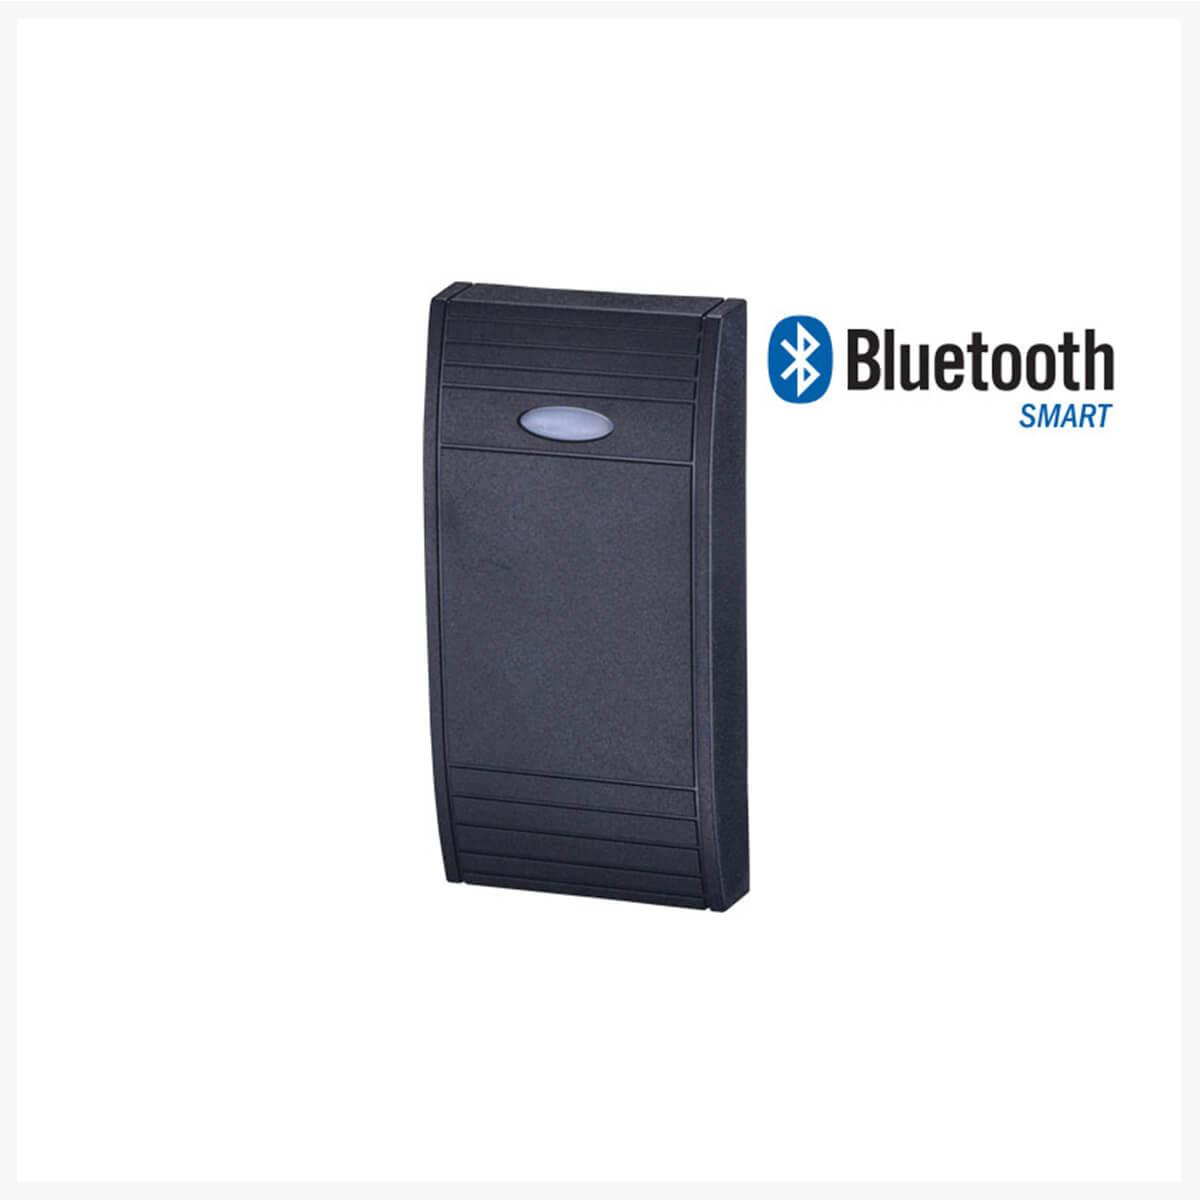 GEM-Gianni-Easiprox-Slim-Bluetooth-Proximity-Readers-